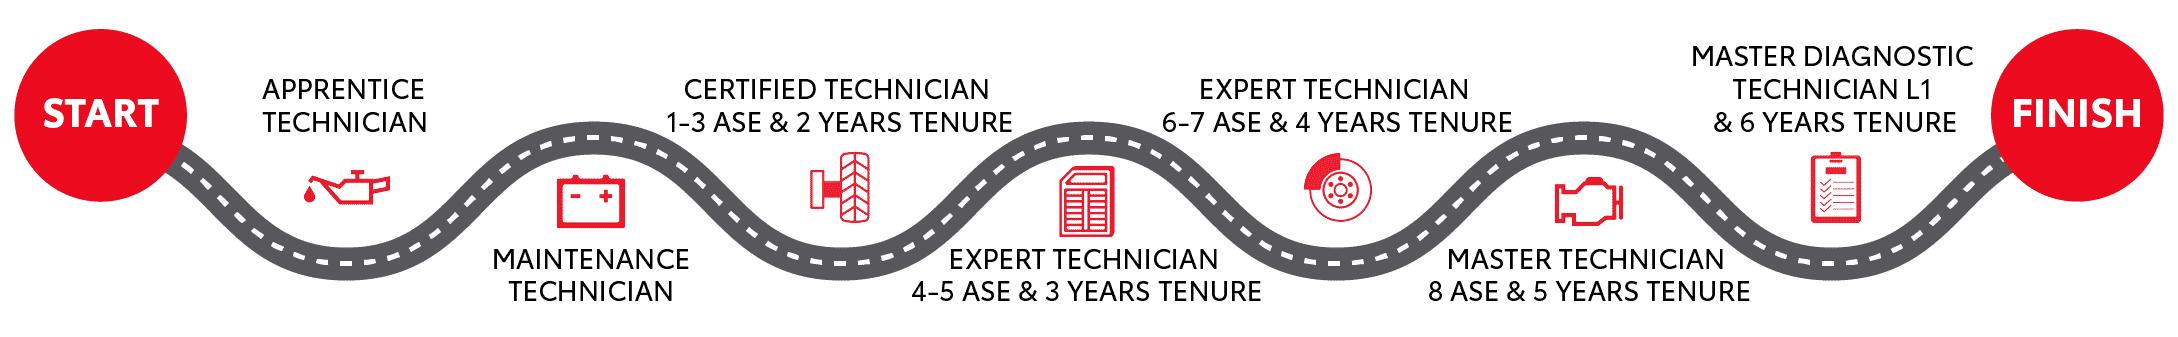 Tech career path